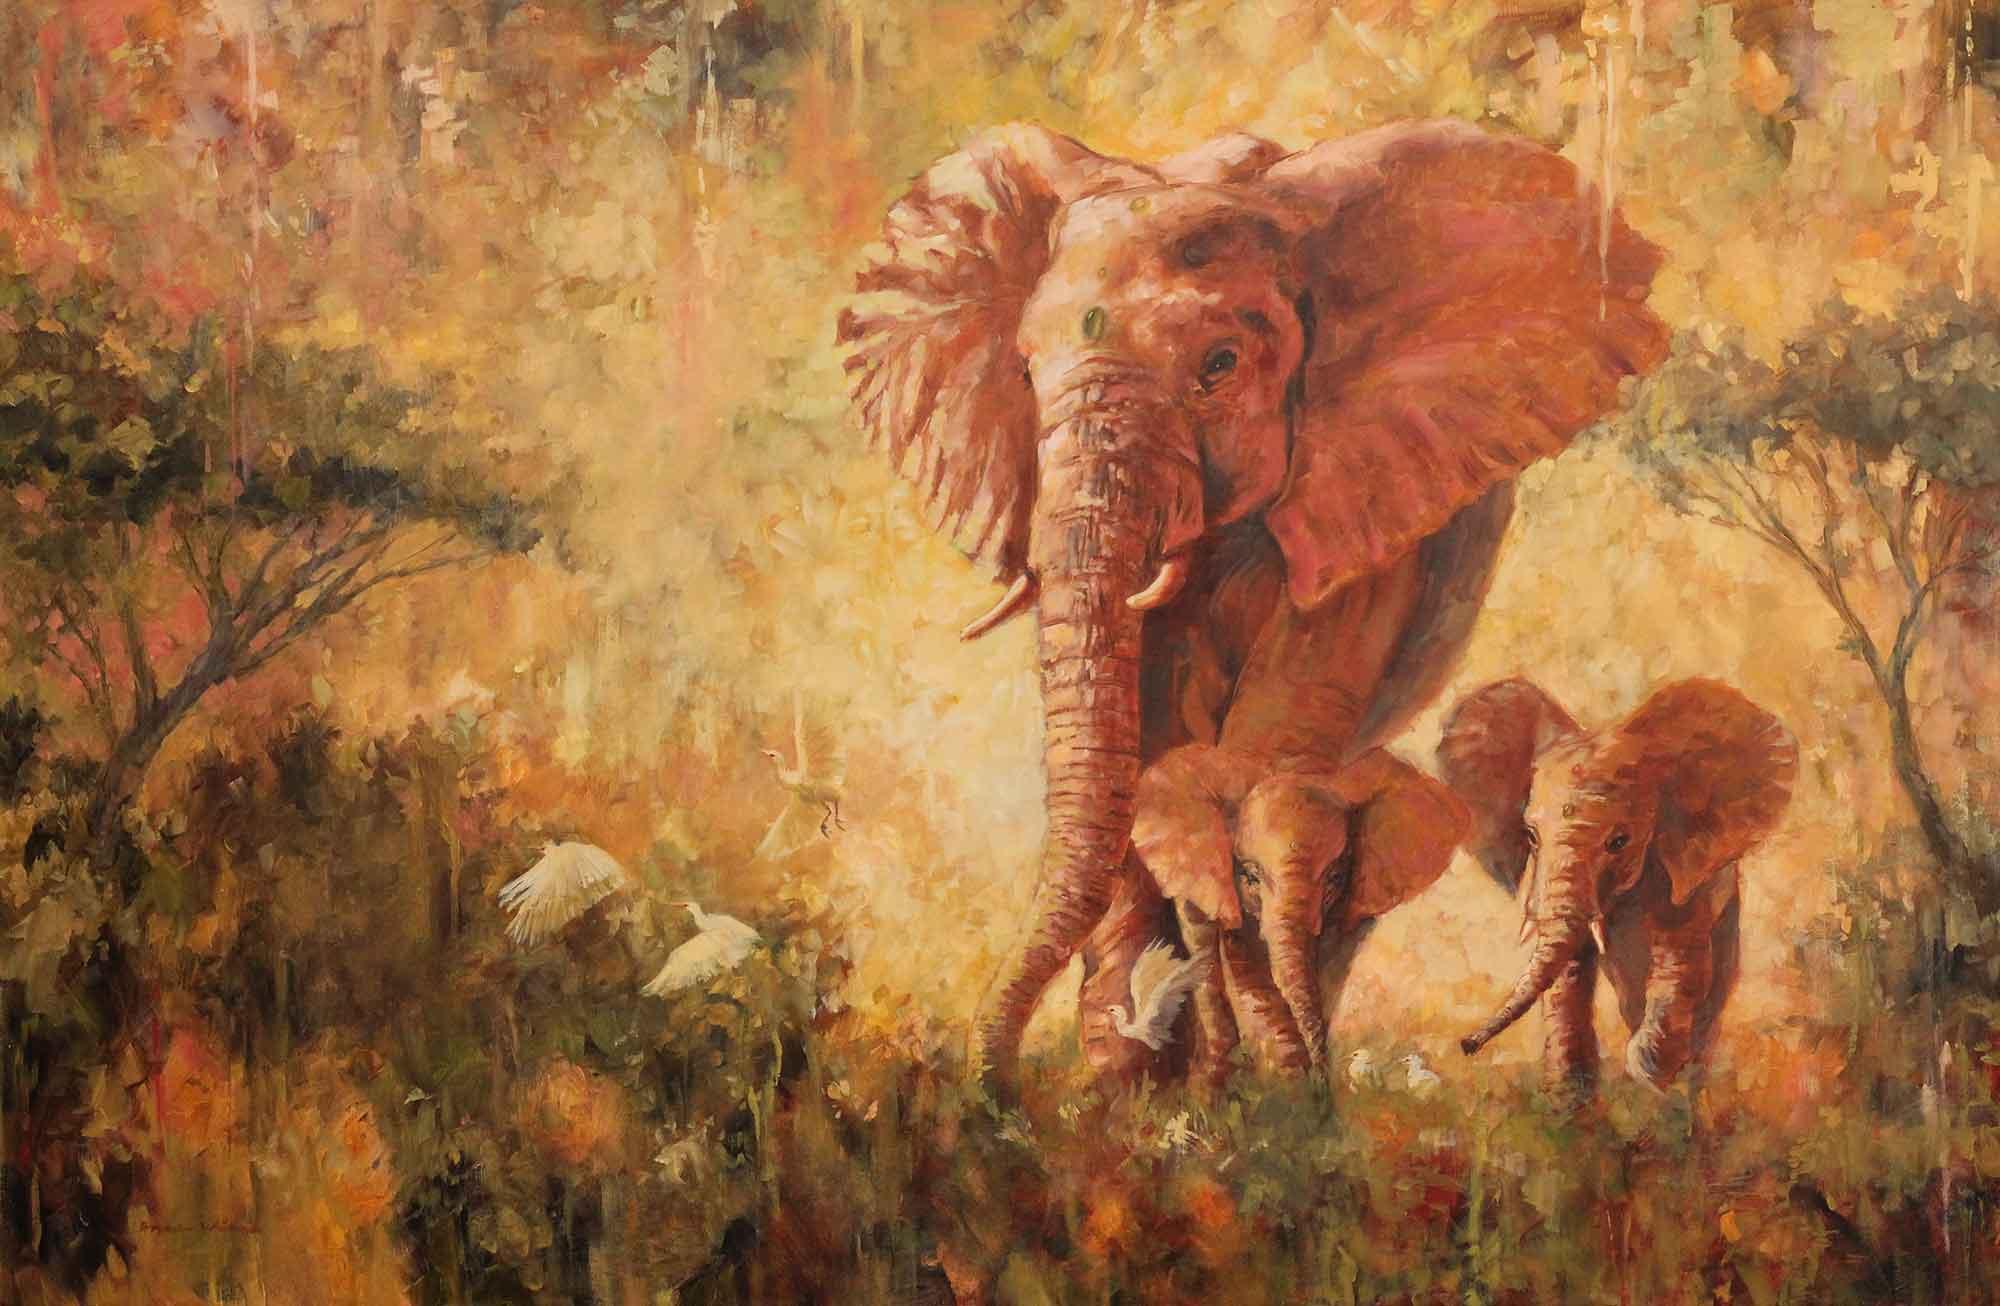 new.elephant.painting.squarespace.jpg